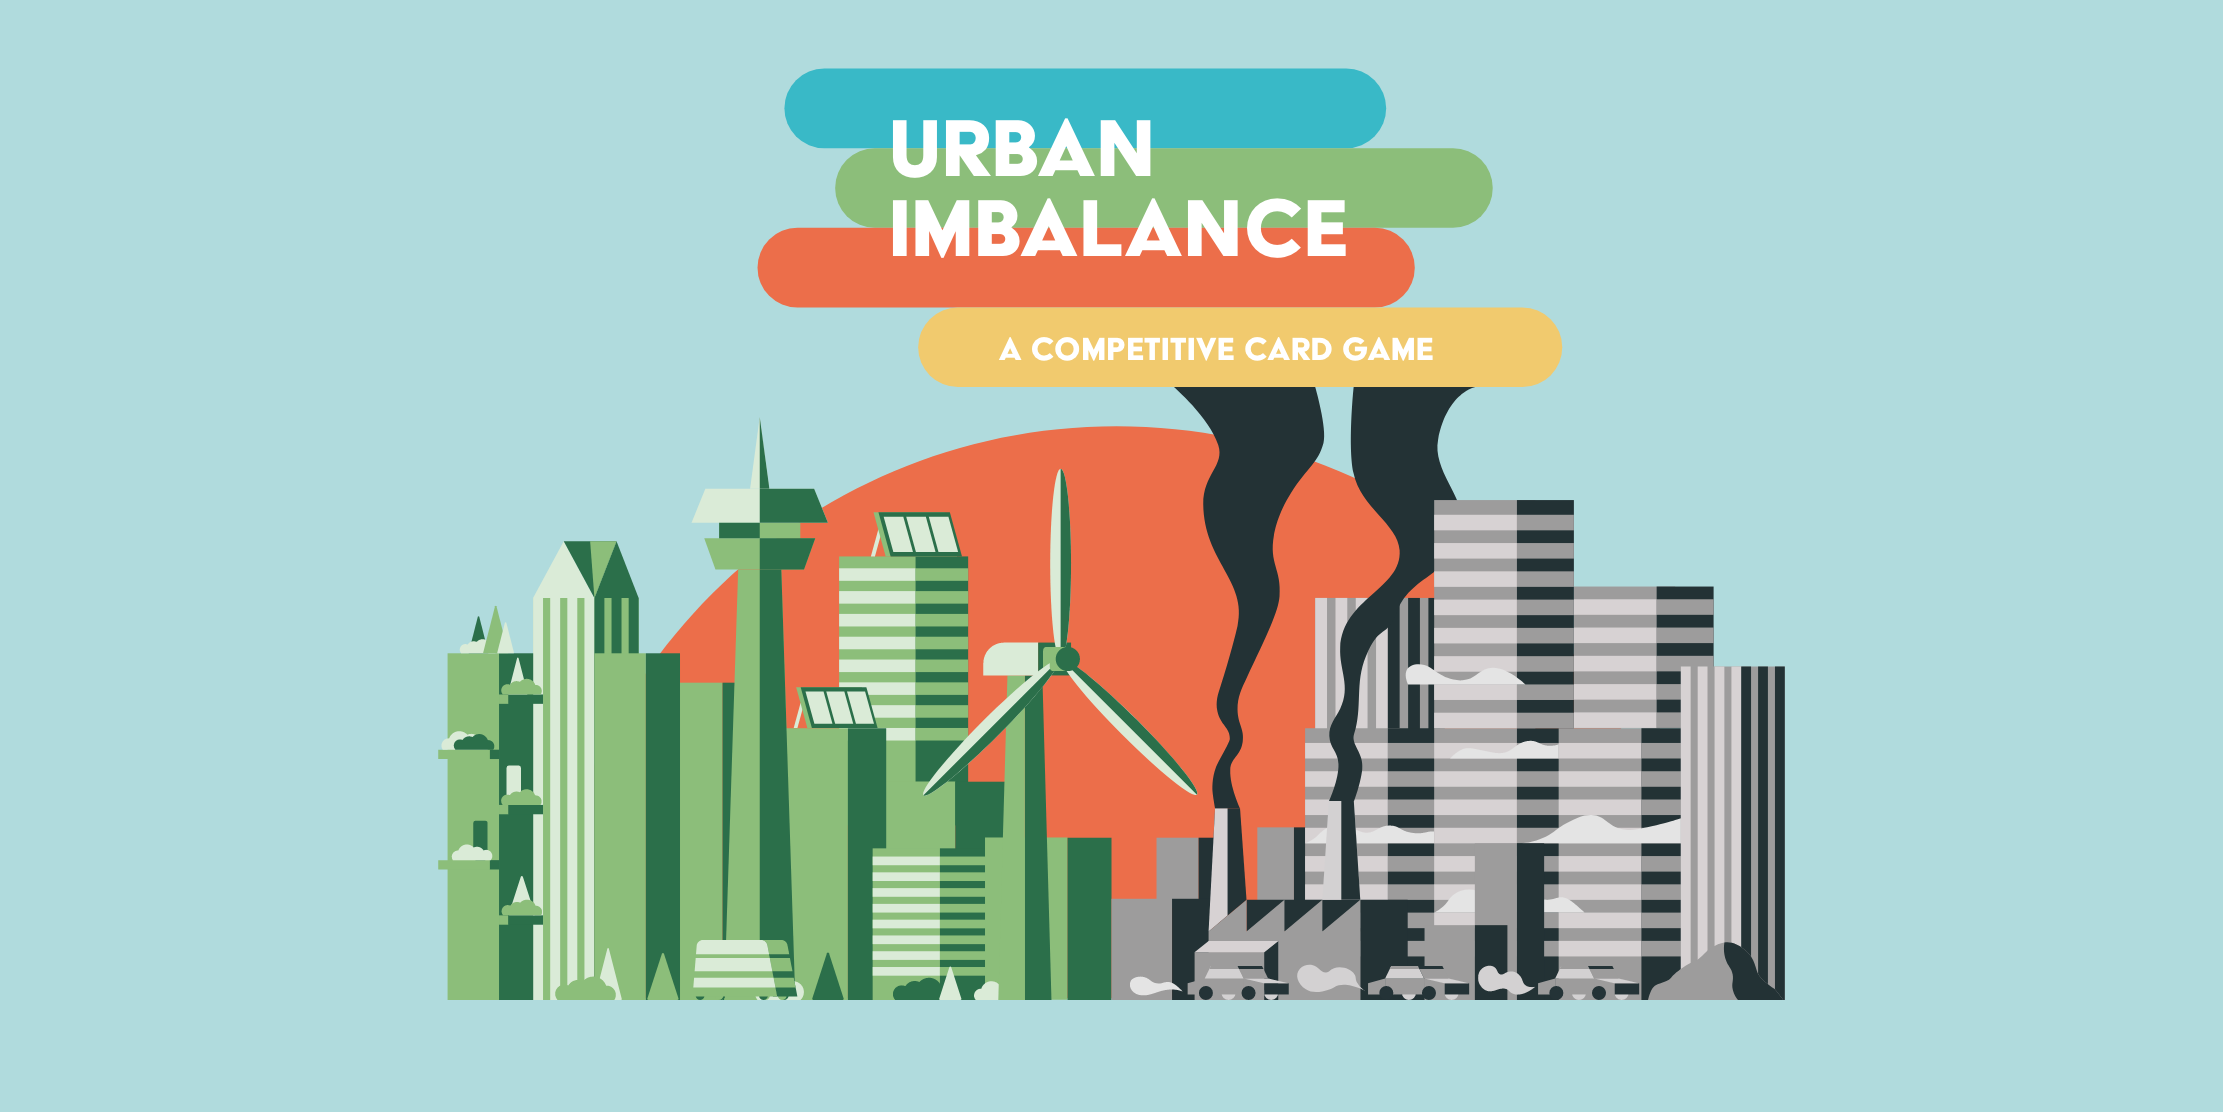 Urban Imbalance, ein kompetitives Kartenspiel